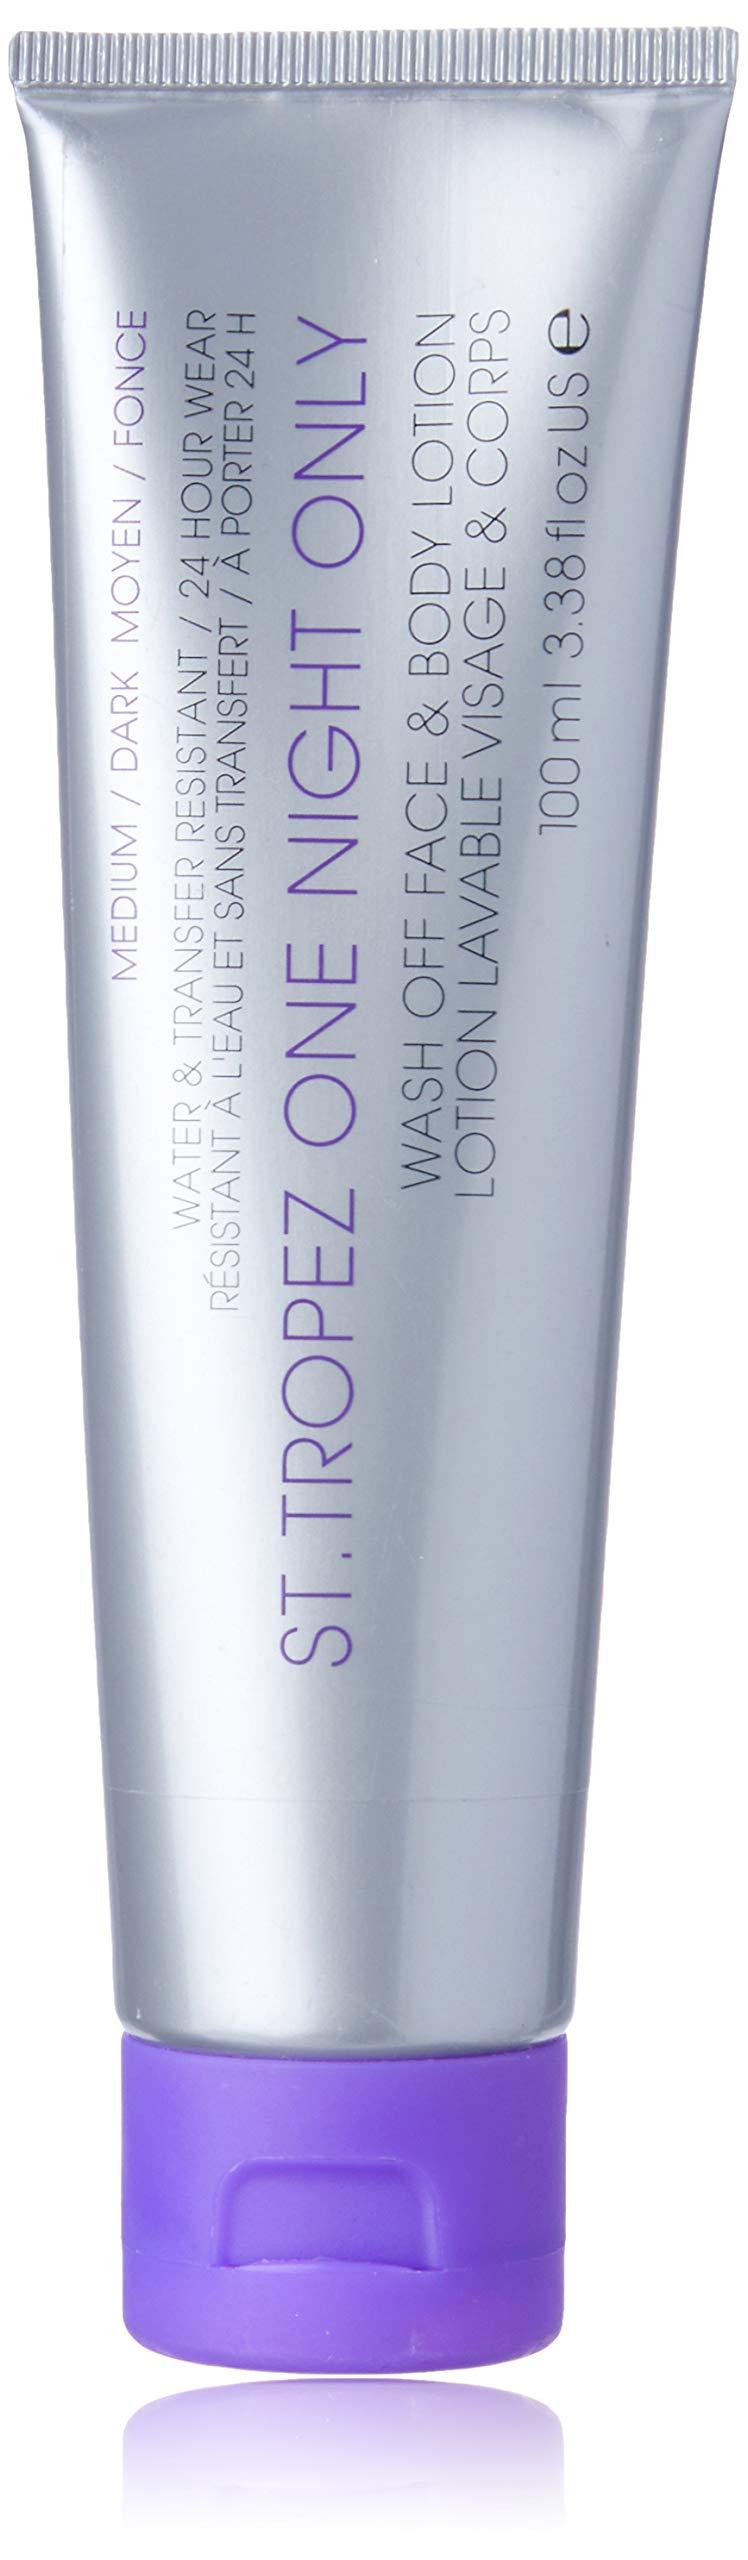 St. Tropez One Night Only Wash Off Face & Body Lotion, Medium/Dark by ST TROPEZ